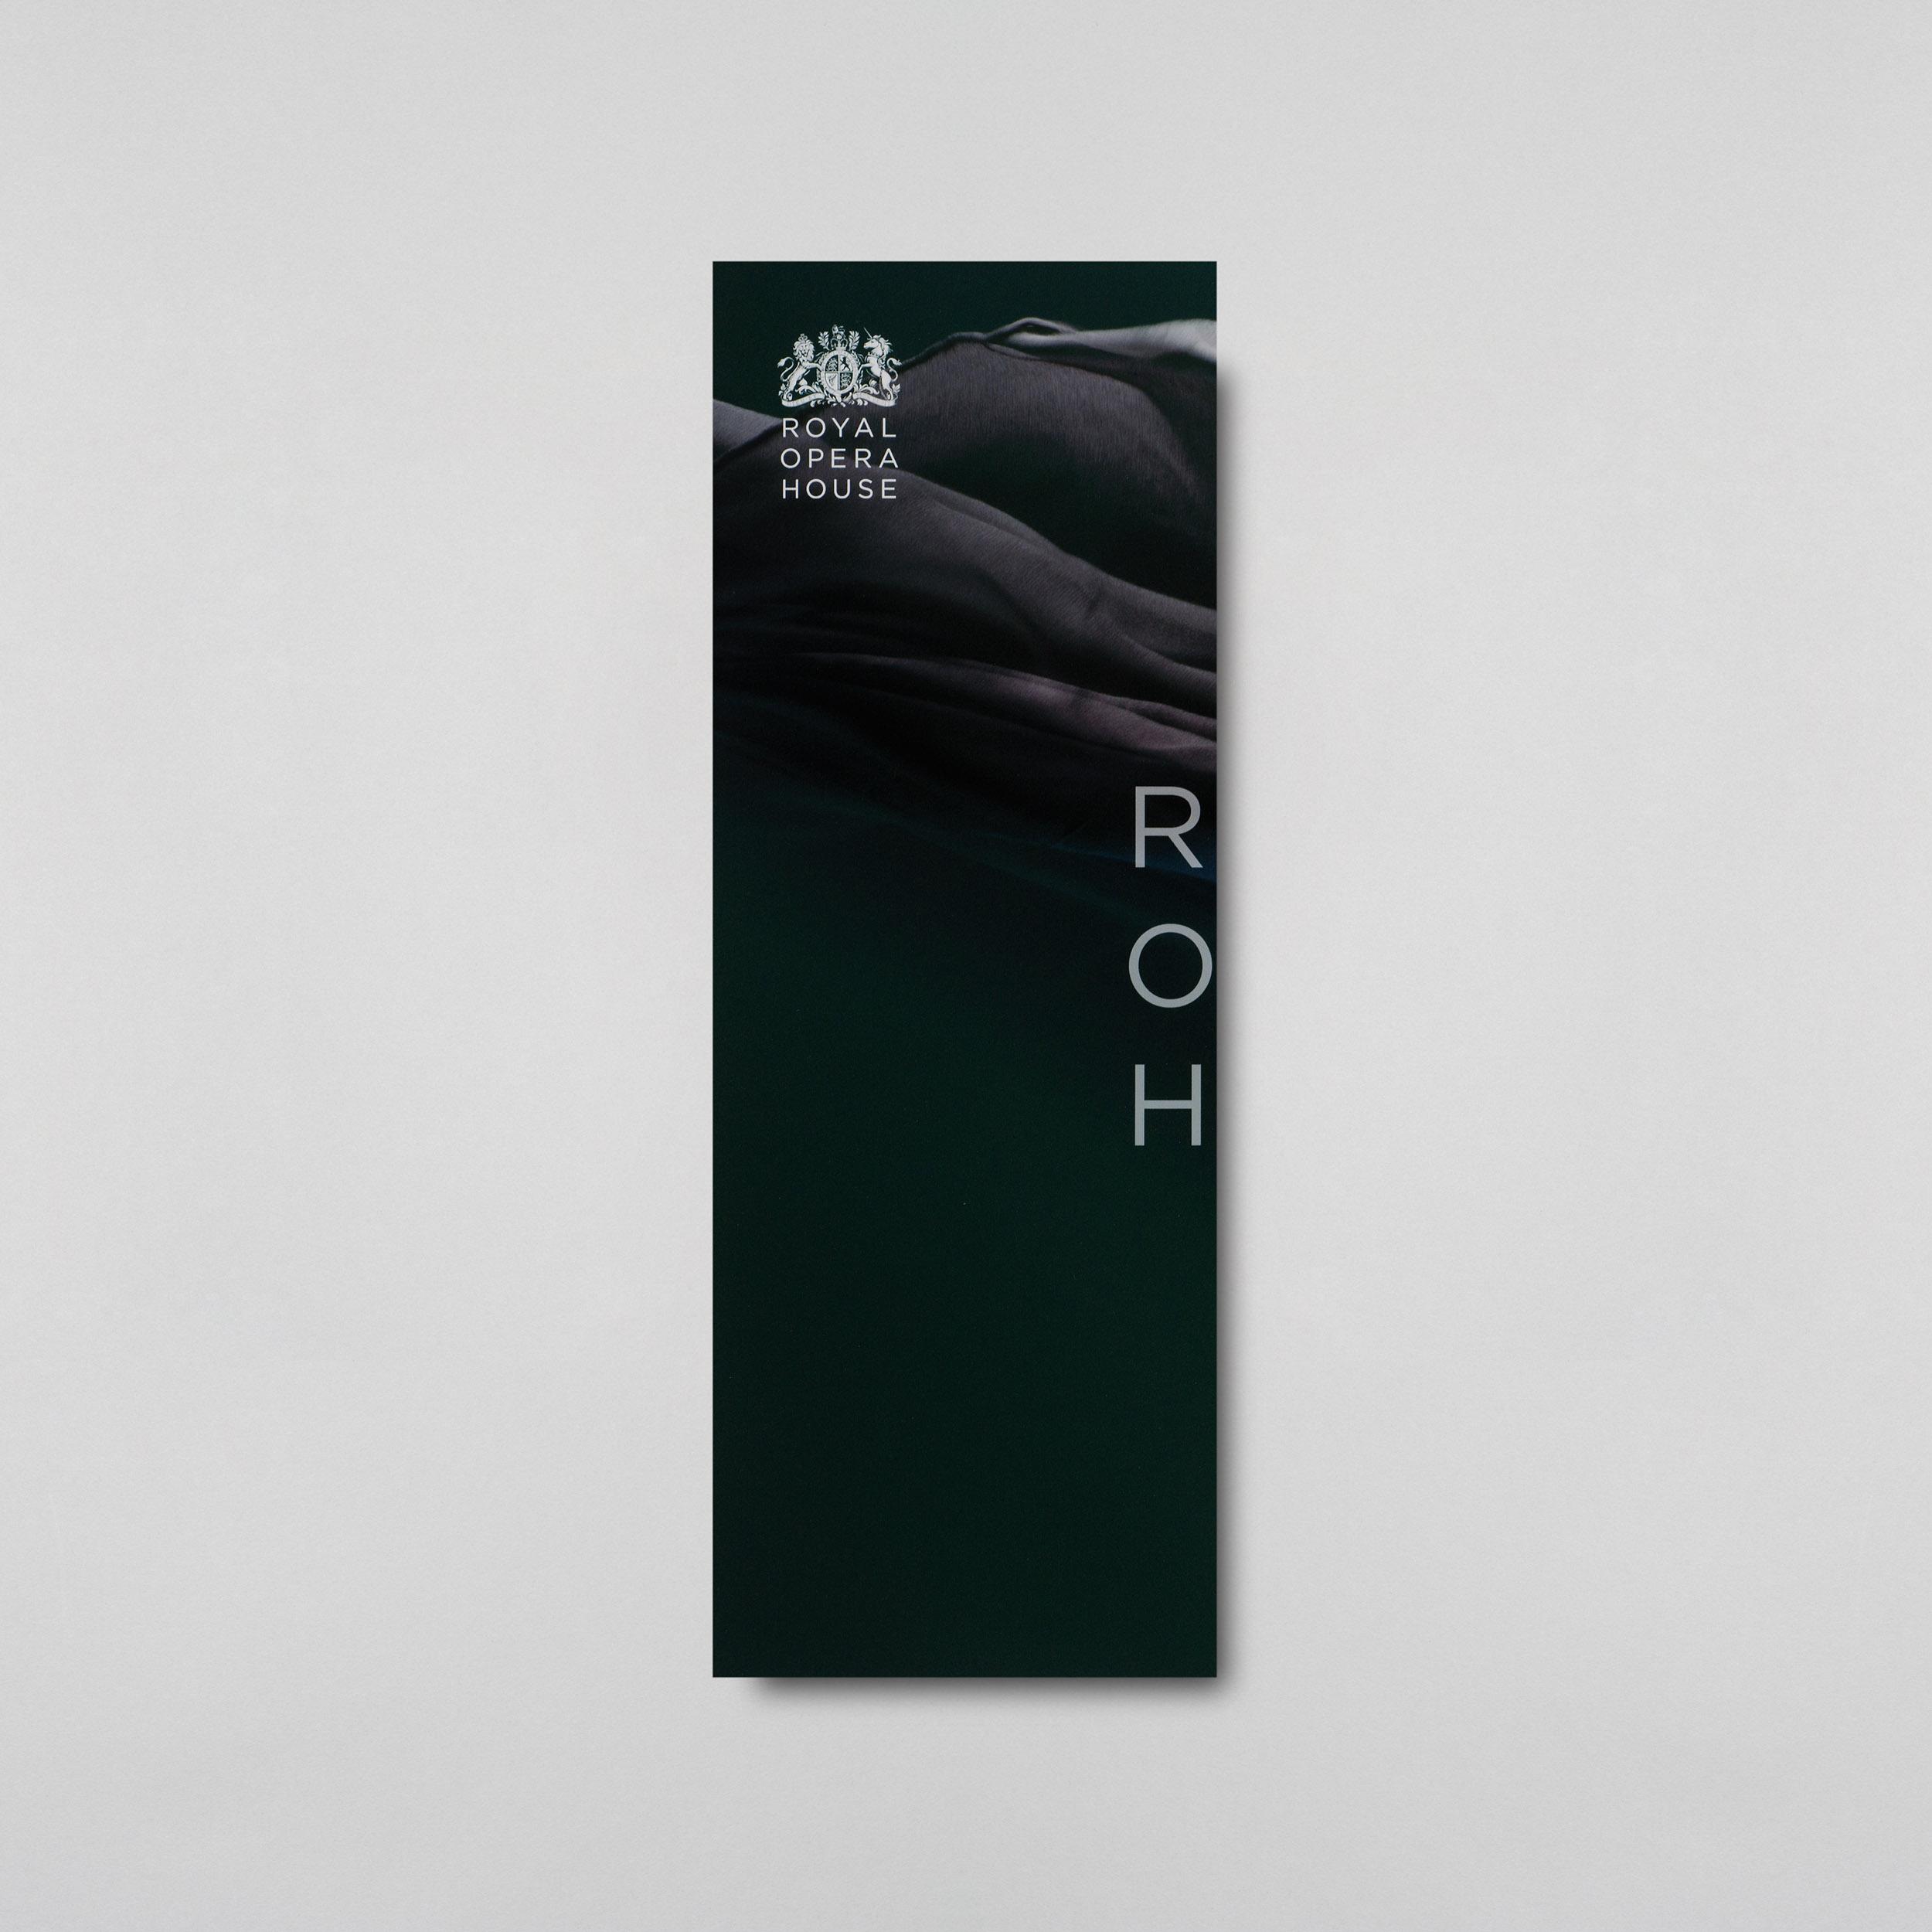 ROH_Brochure-cover.jpg